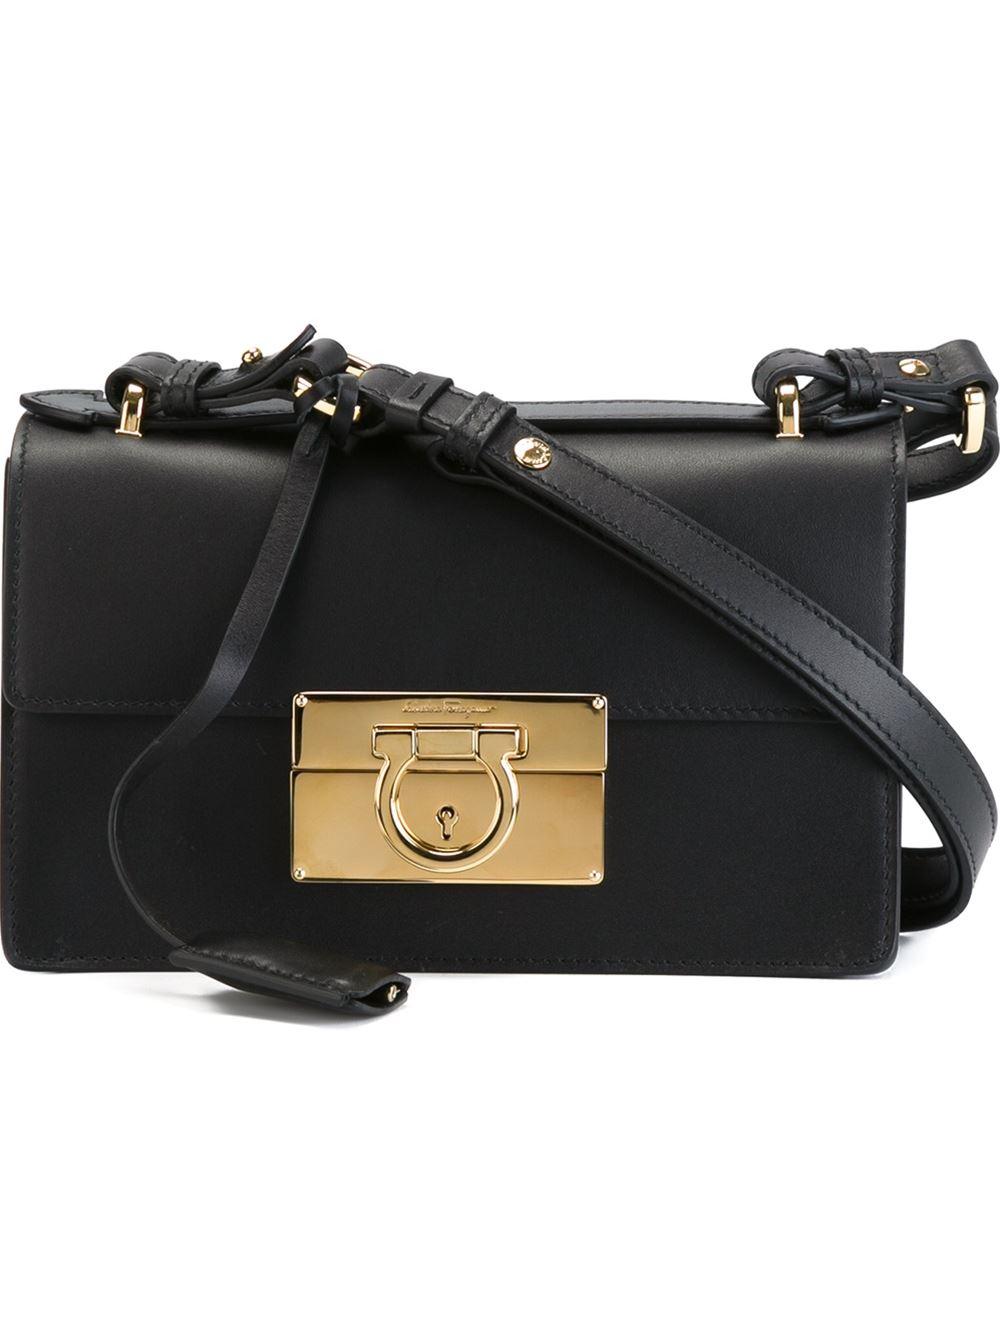 Lyst - Ferragamo  aileen  Shoulder Bag in Black de3d18869b092